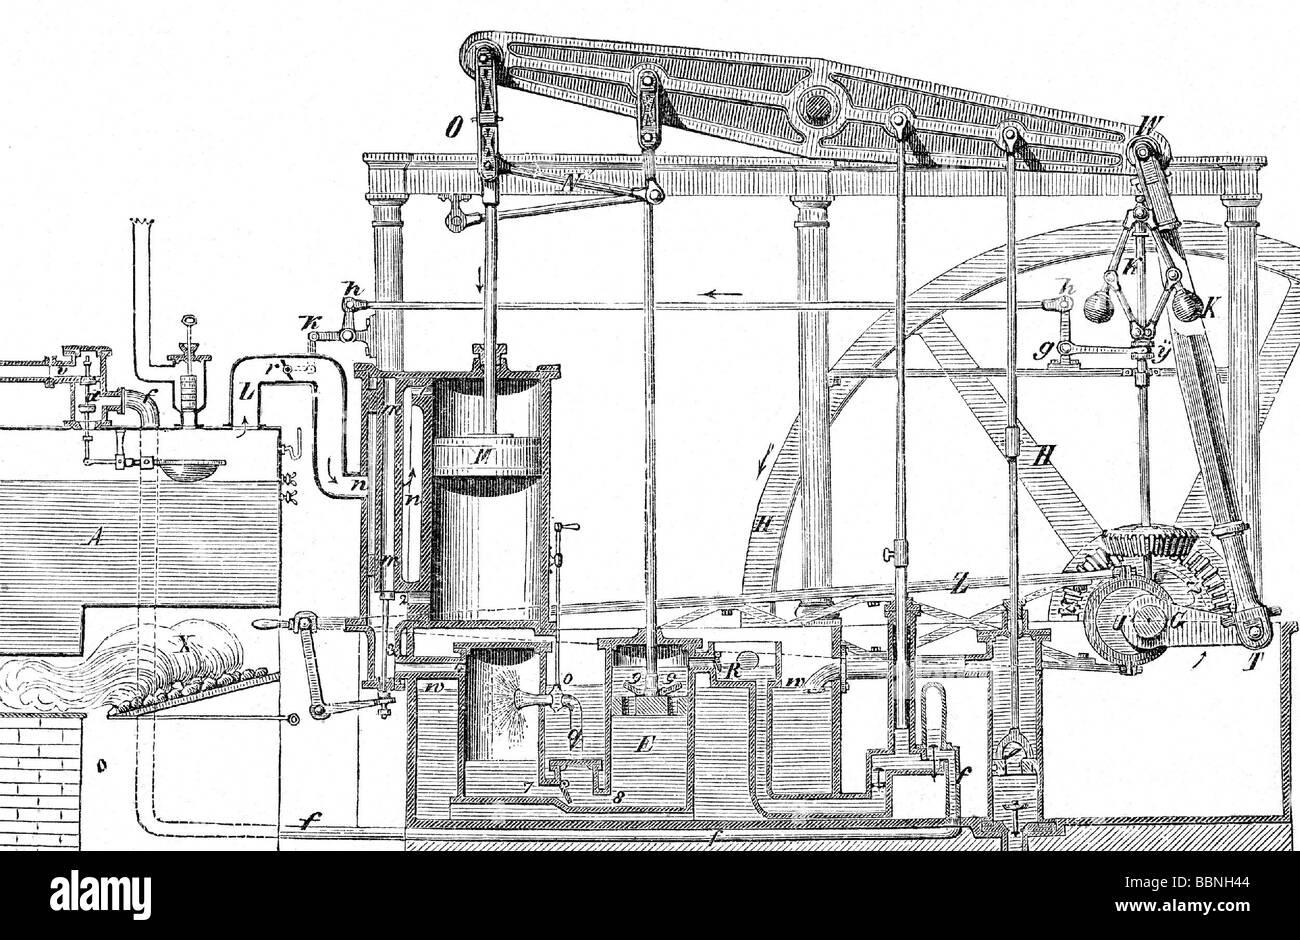 Watt, James, 19.1.1736 - 25.8.1819, Scottish engineer, inventor